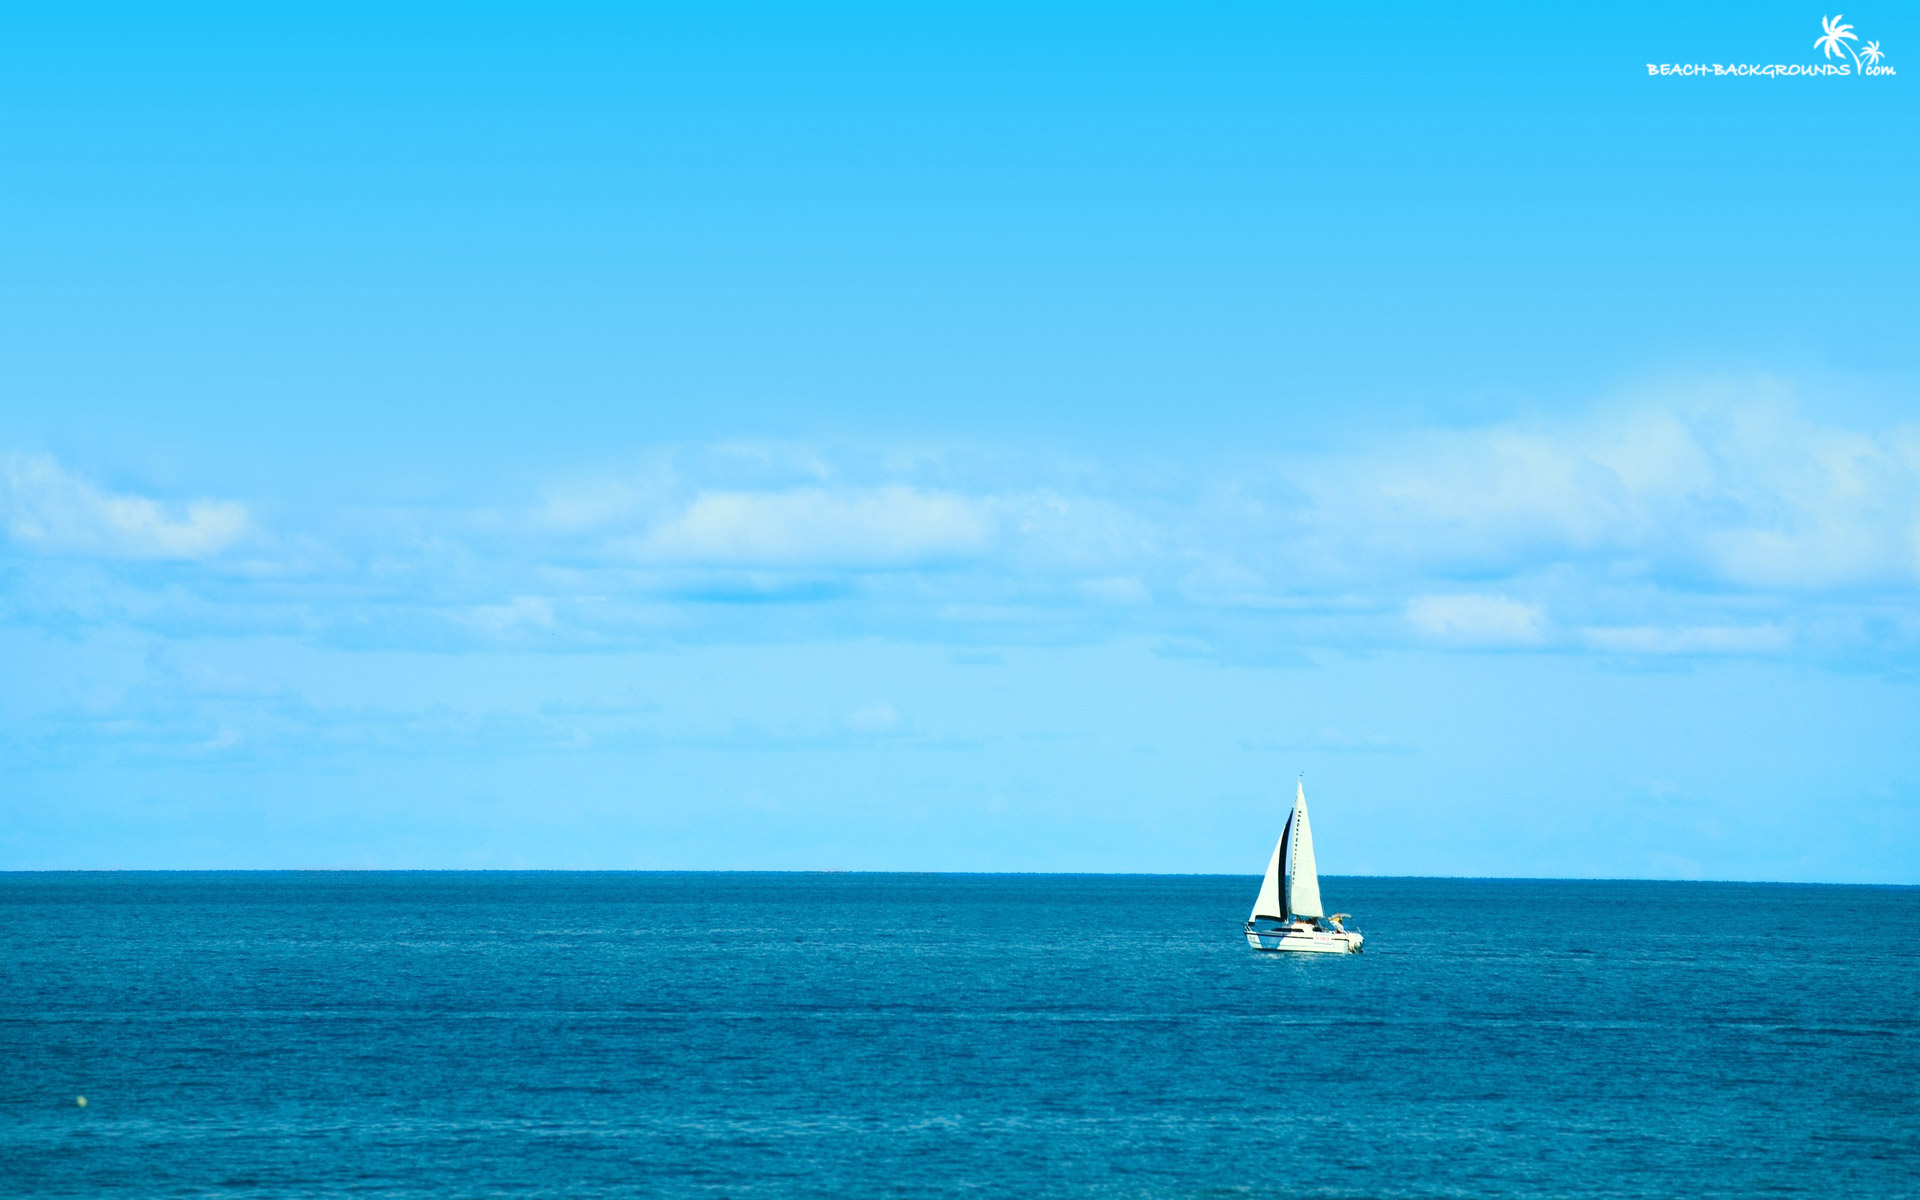 Sailboat Blue Beach Com 300417 Wallpaper wallpaper